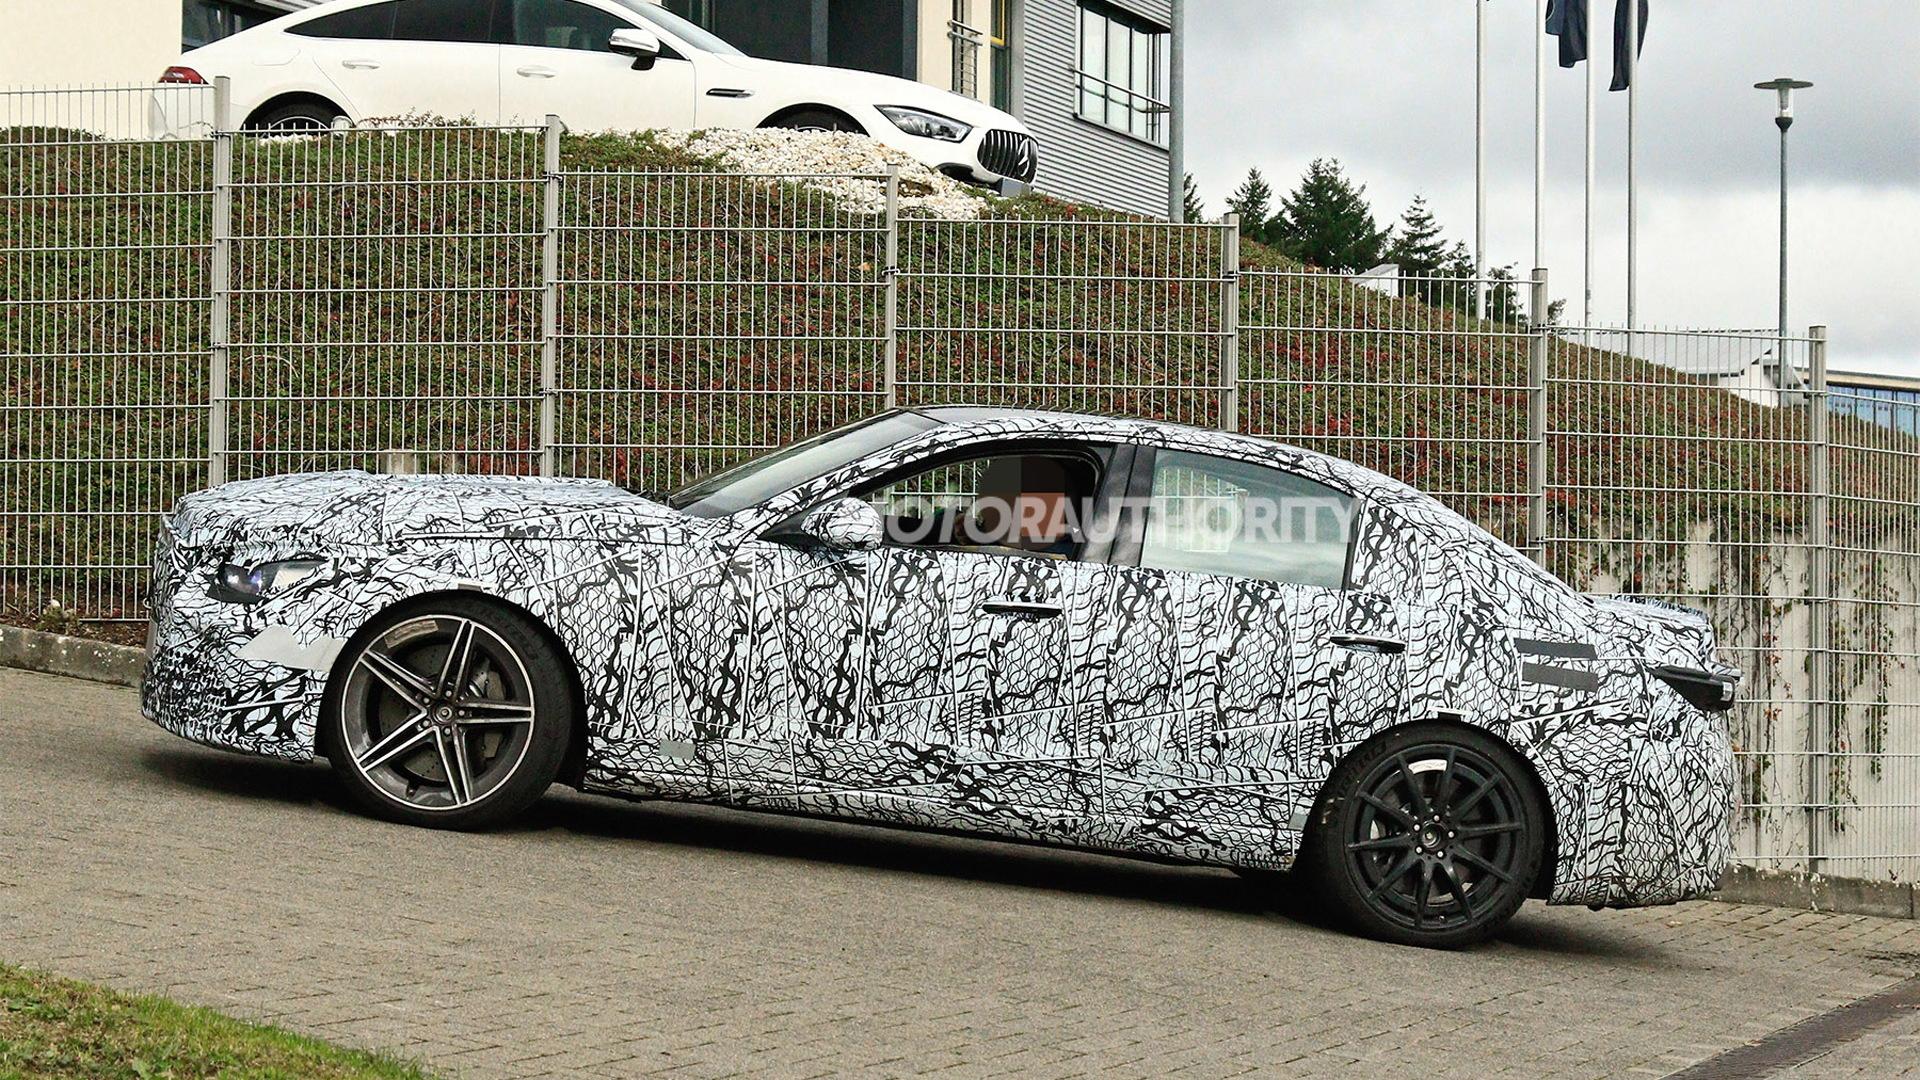 2023 Mercedes-AMG C63 spy shots - Photo credit:S. Baldauf/SB-Medien